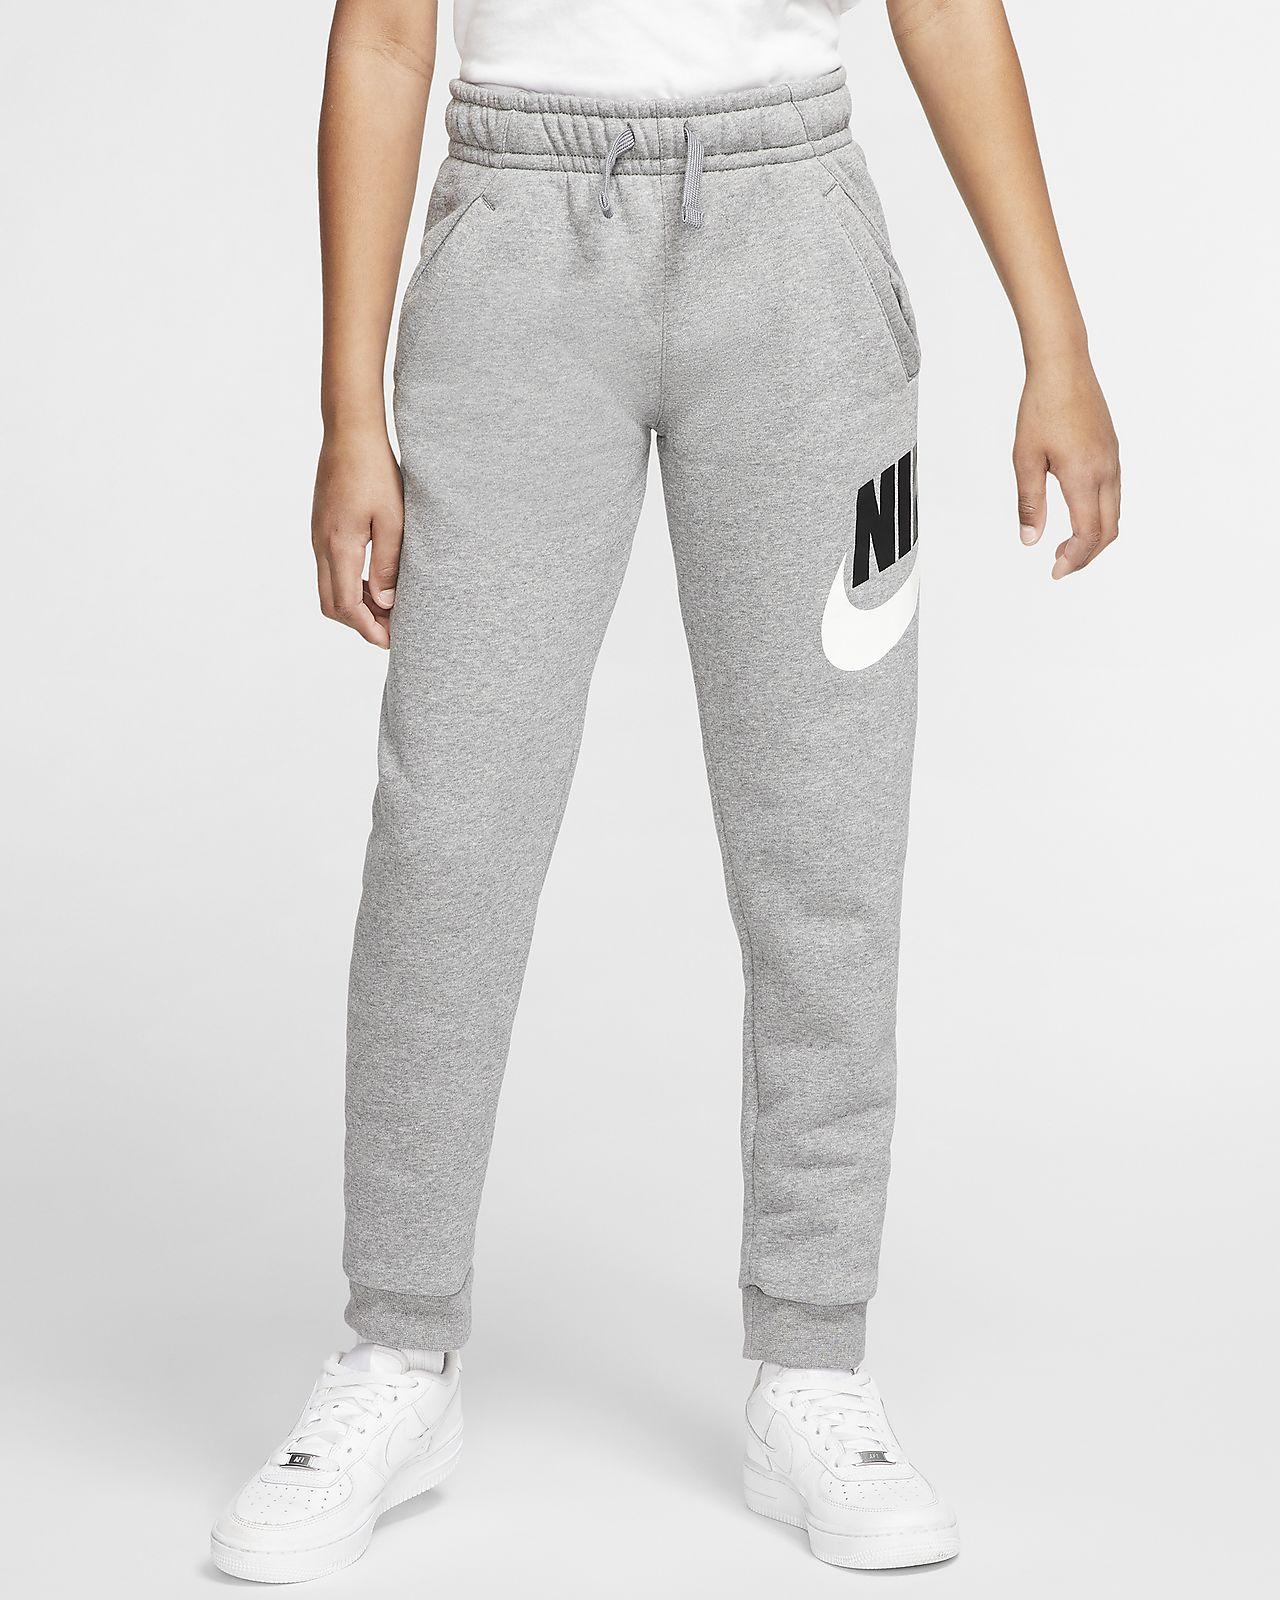 pantaloni ragazzo nike